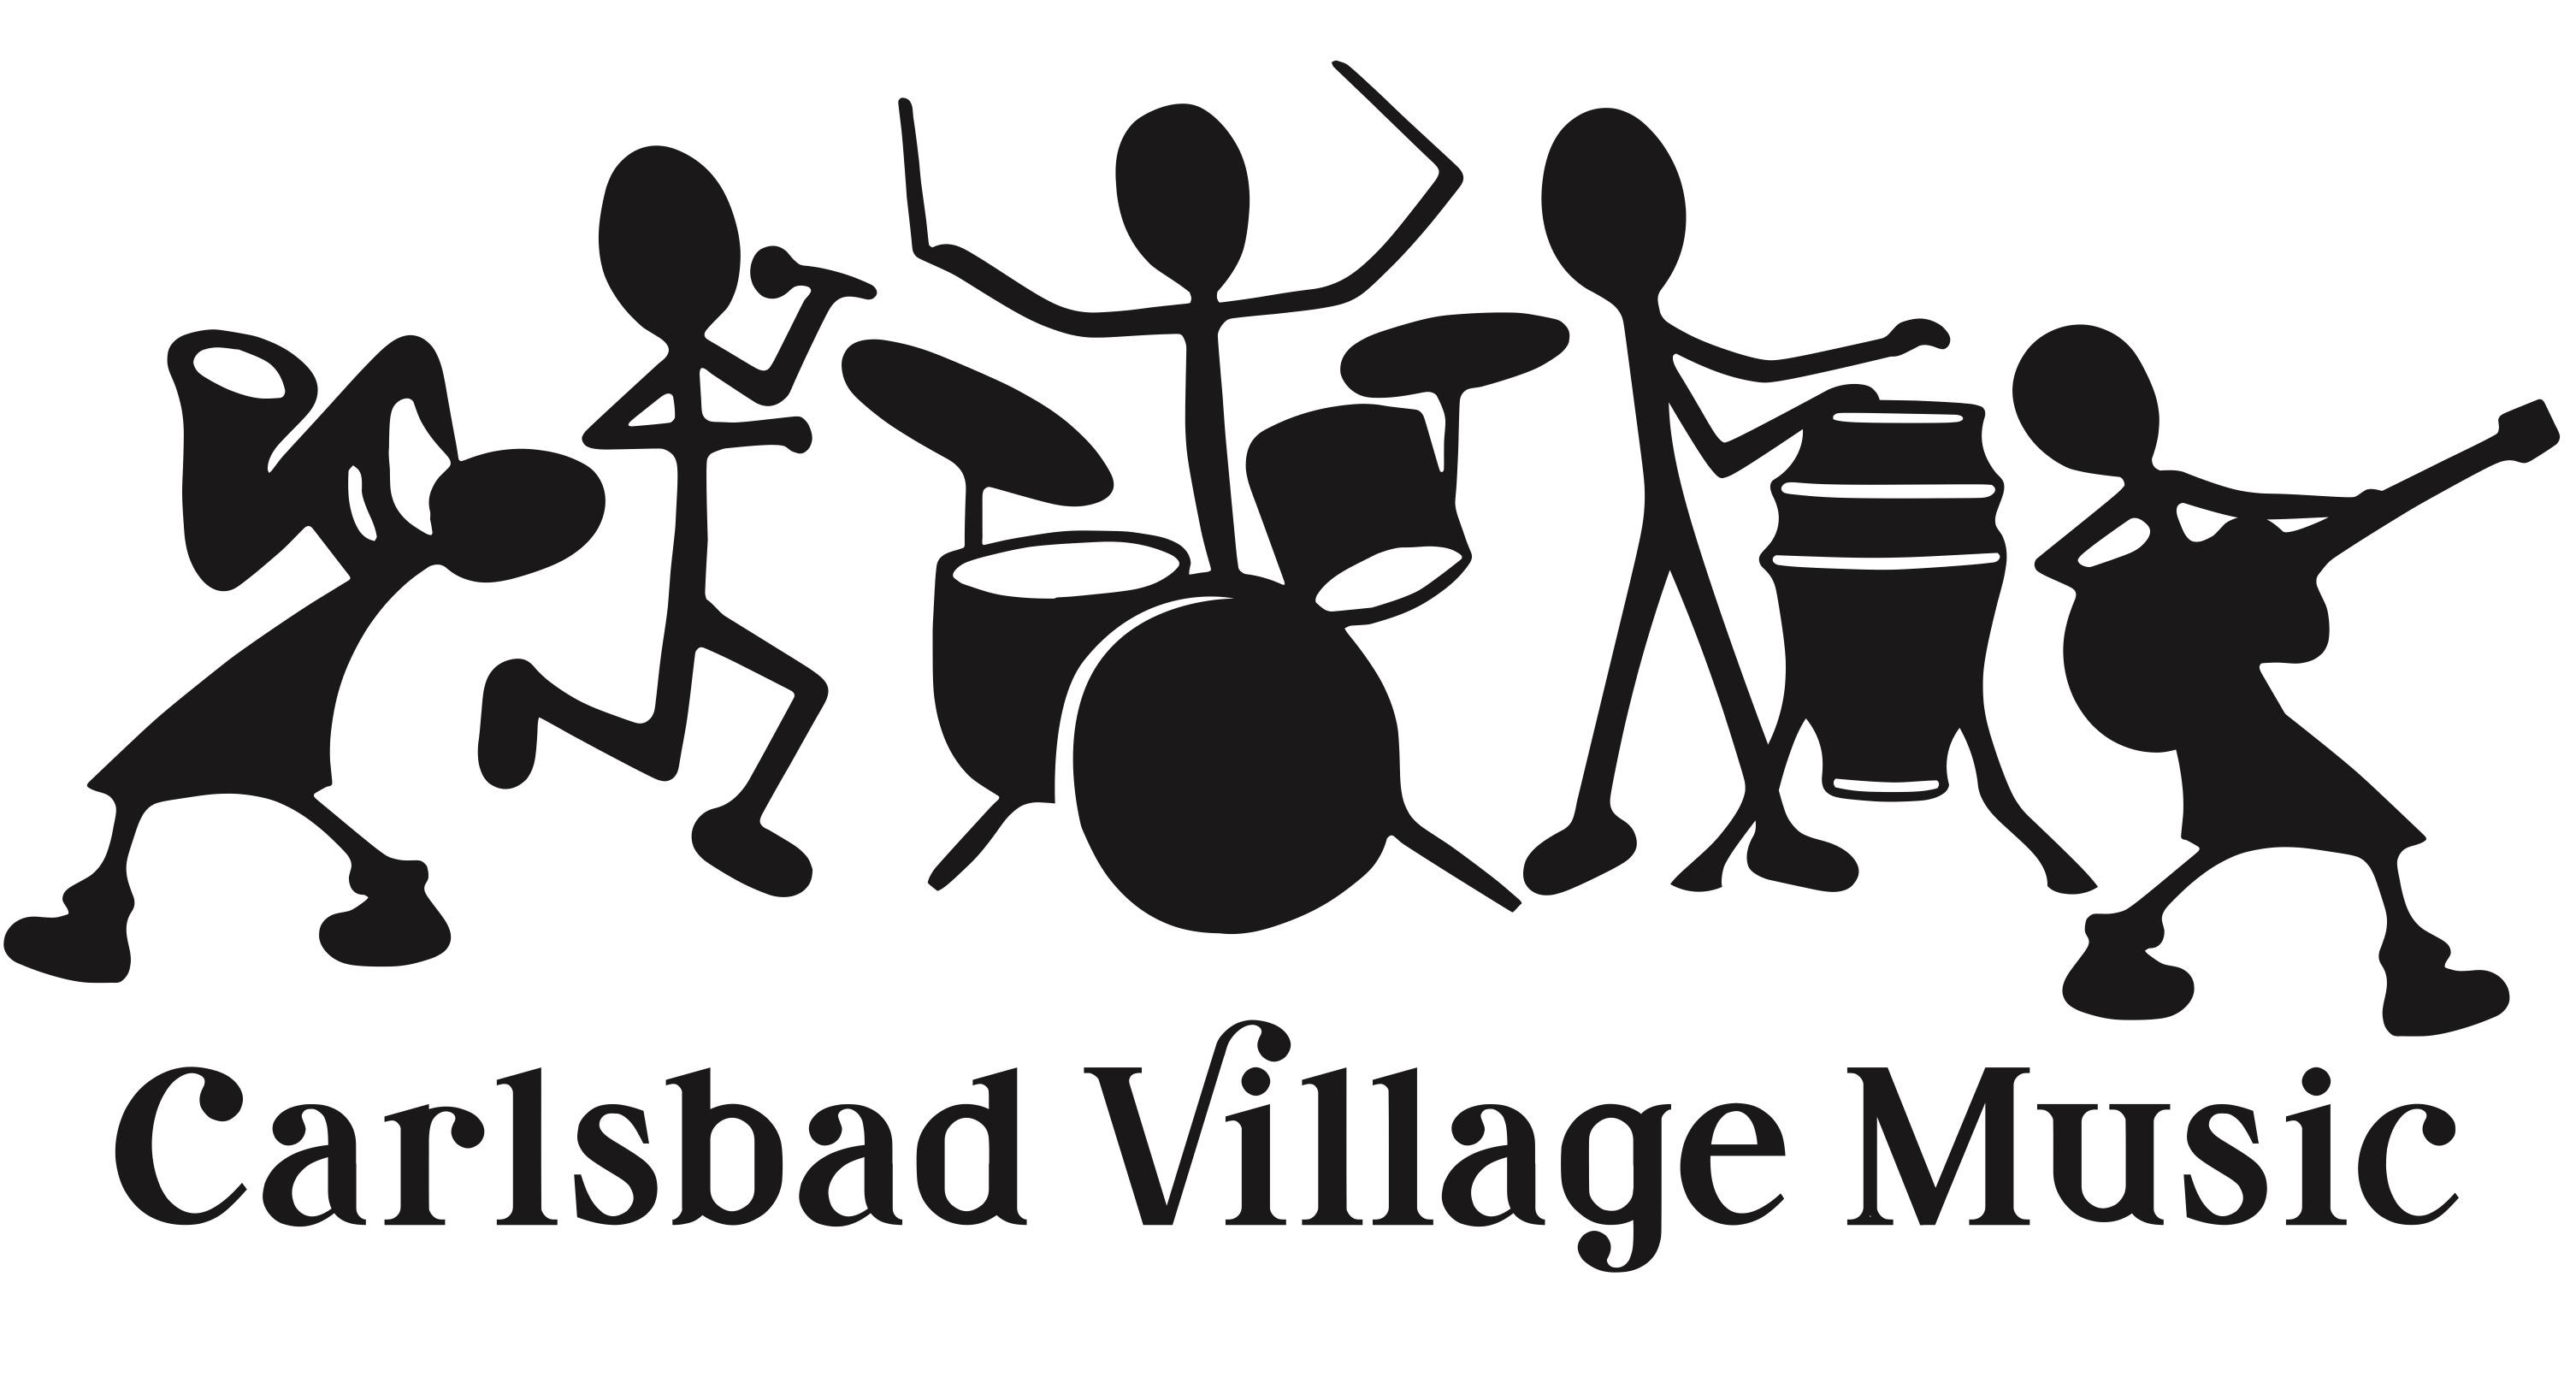 Carlsbad Village Music